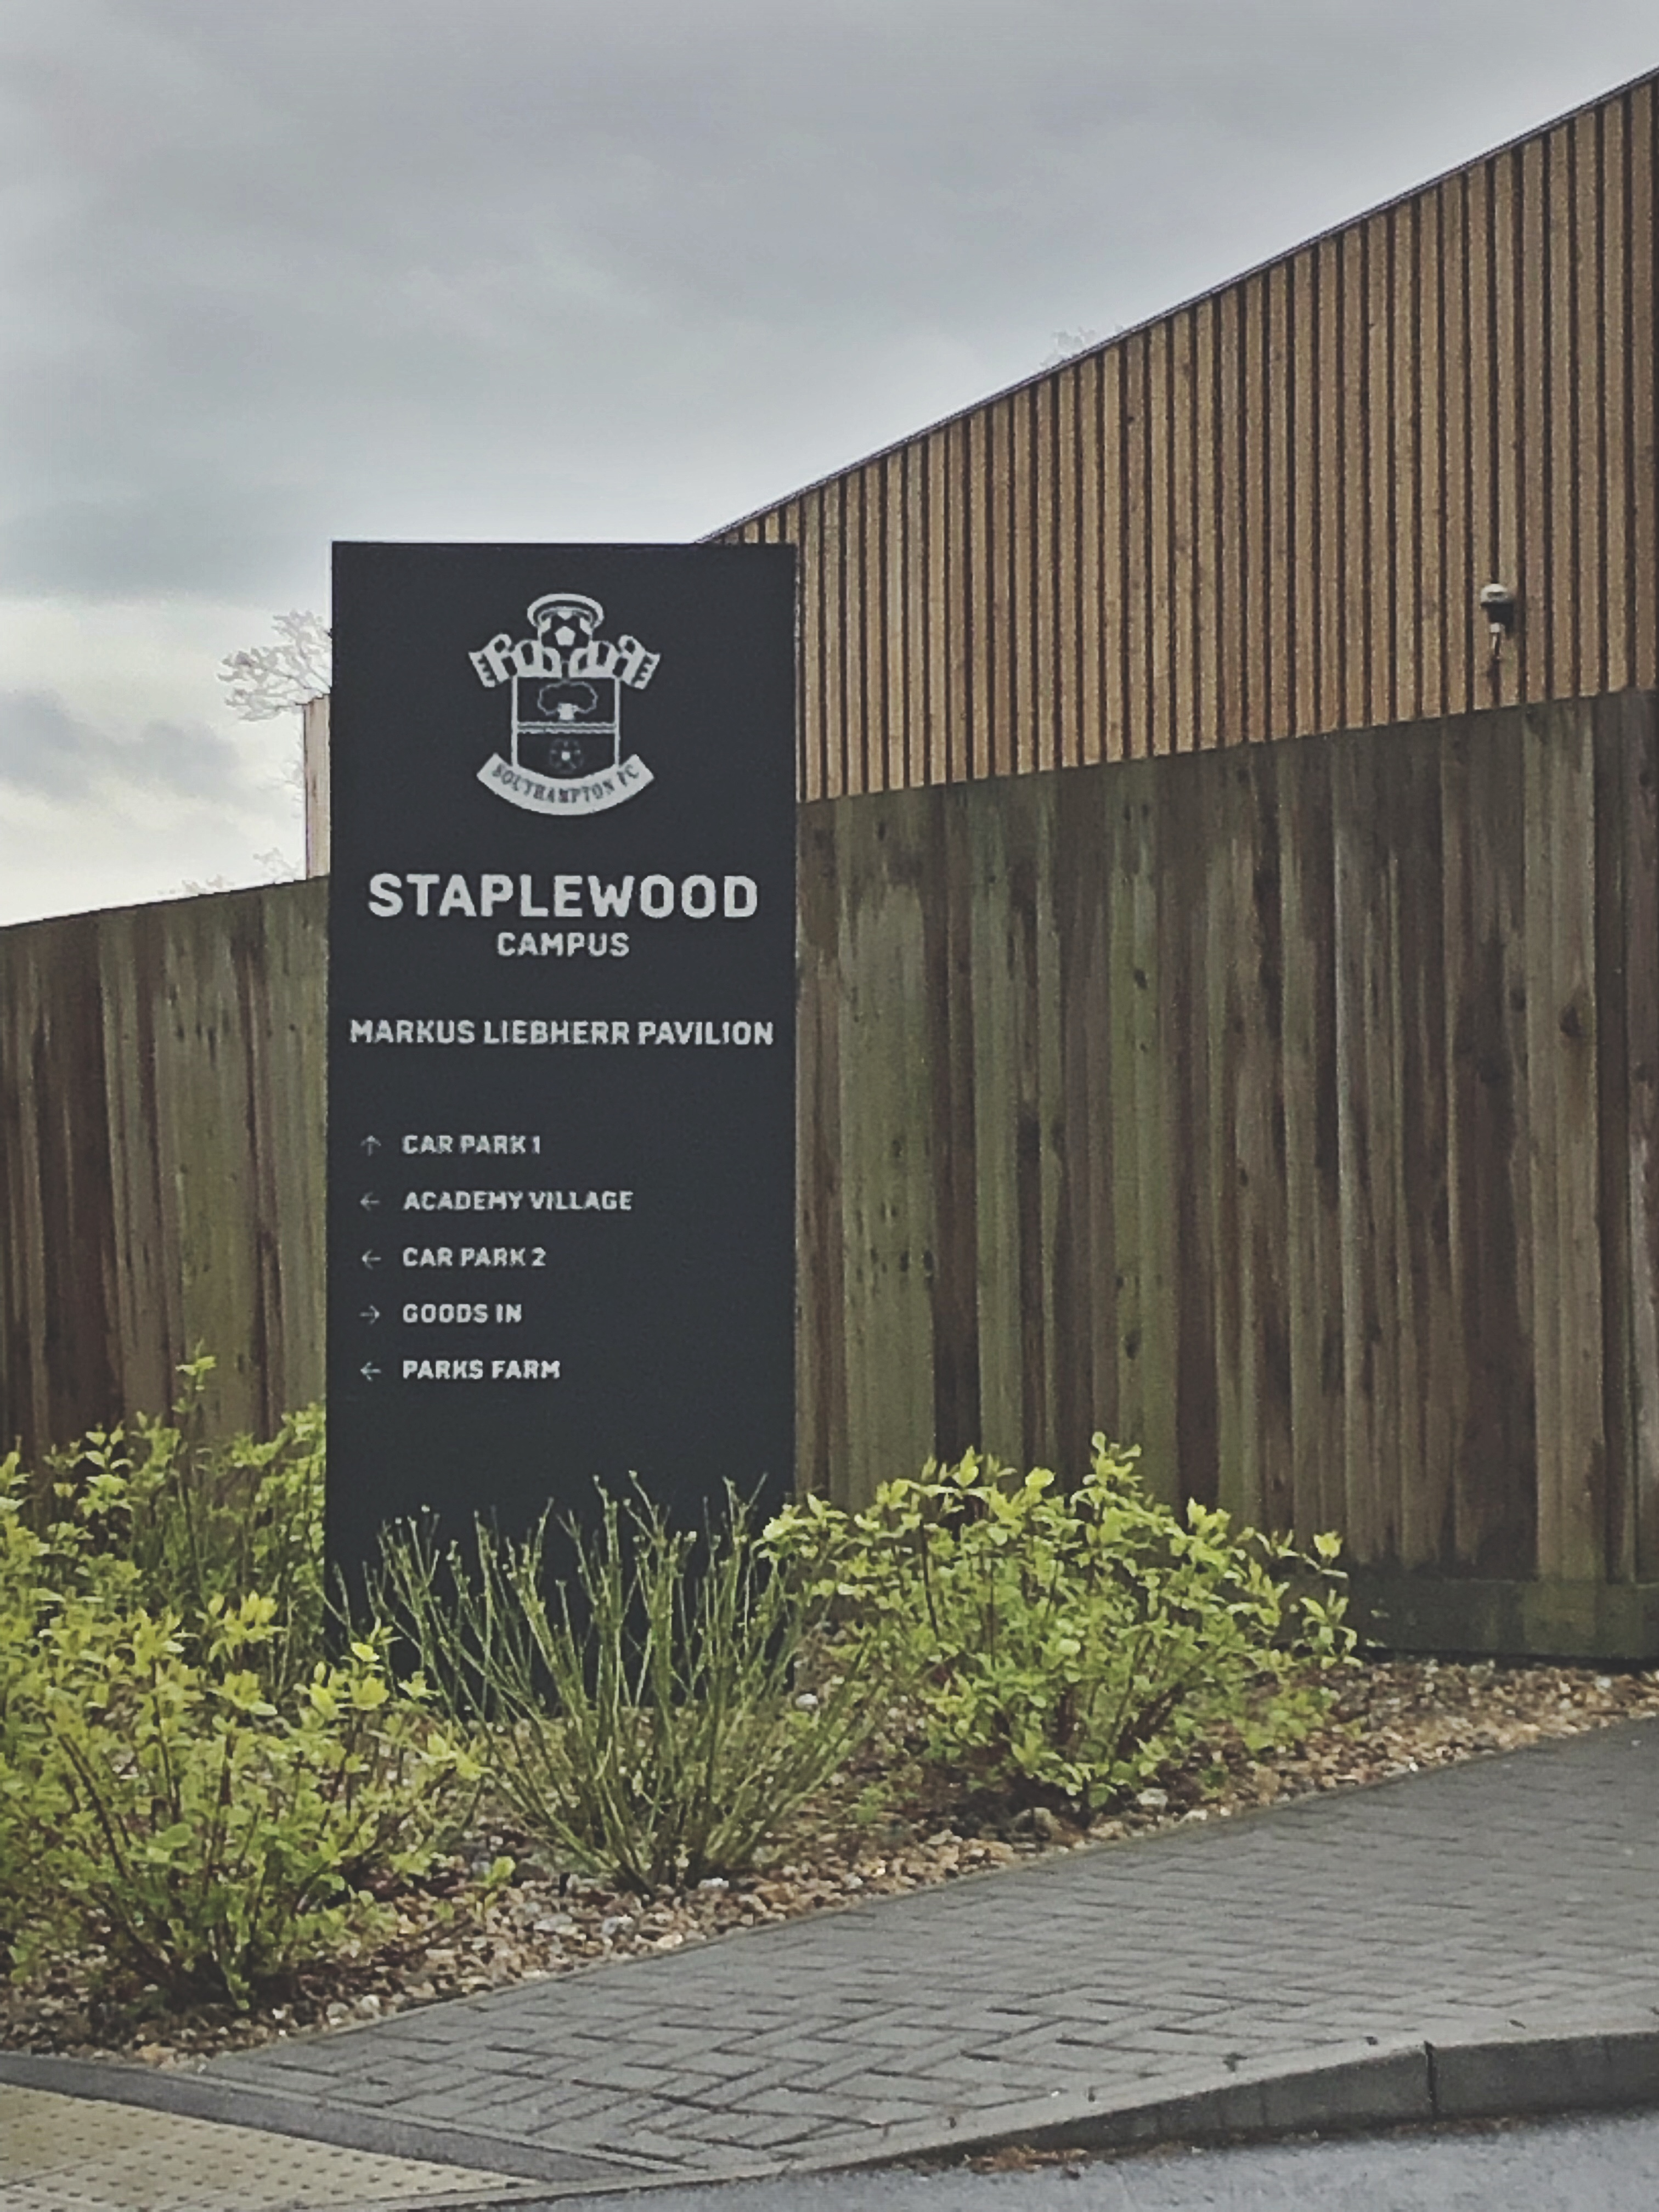 Southampton FC's Staplewood Training Ground